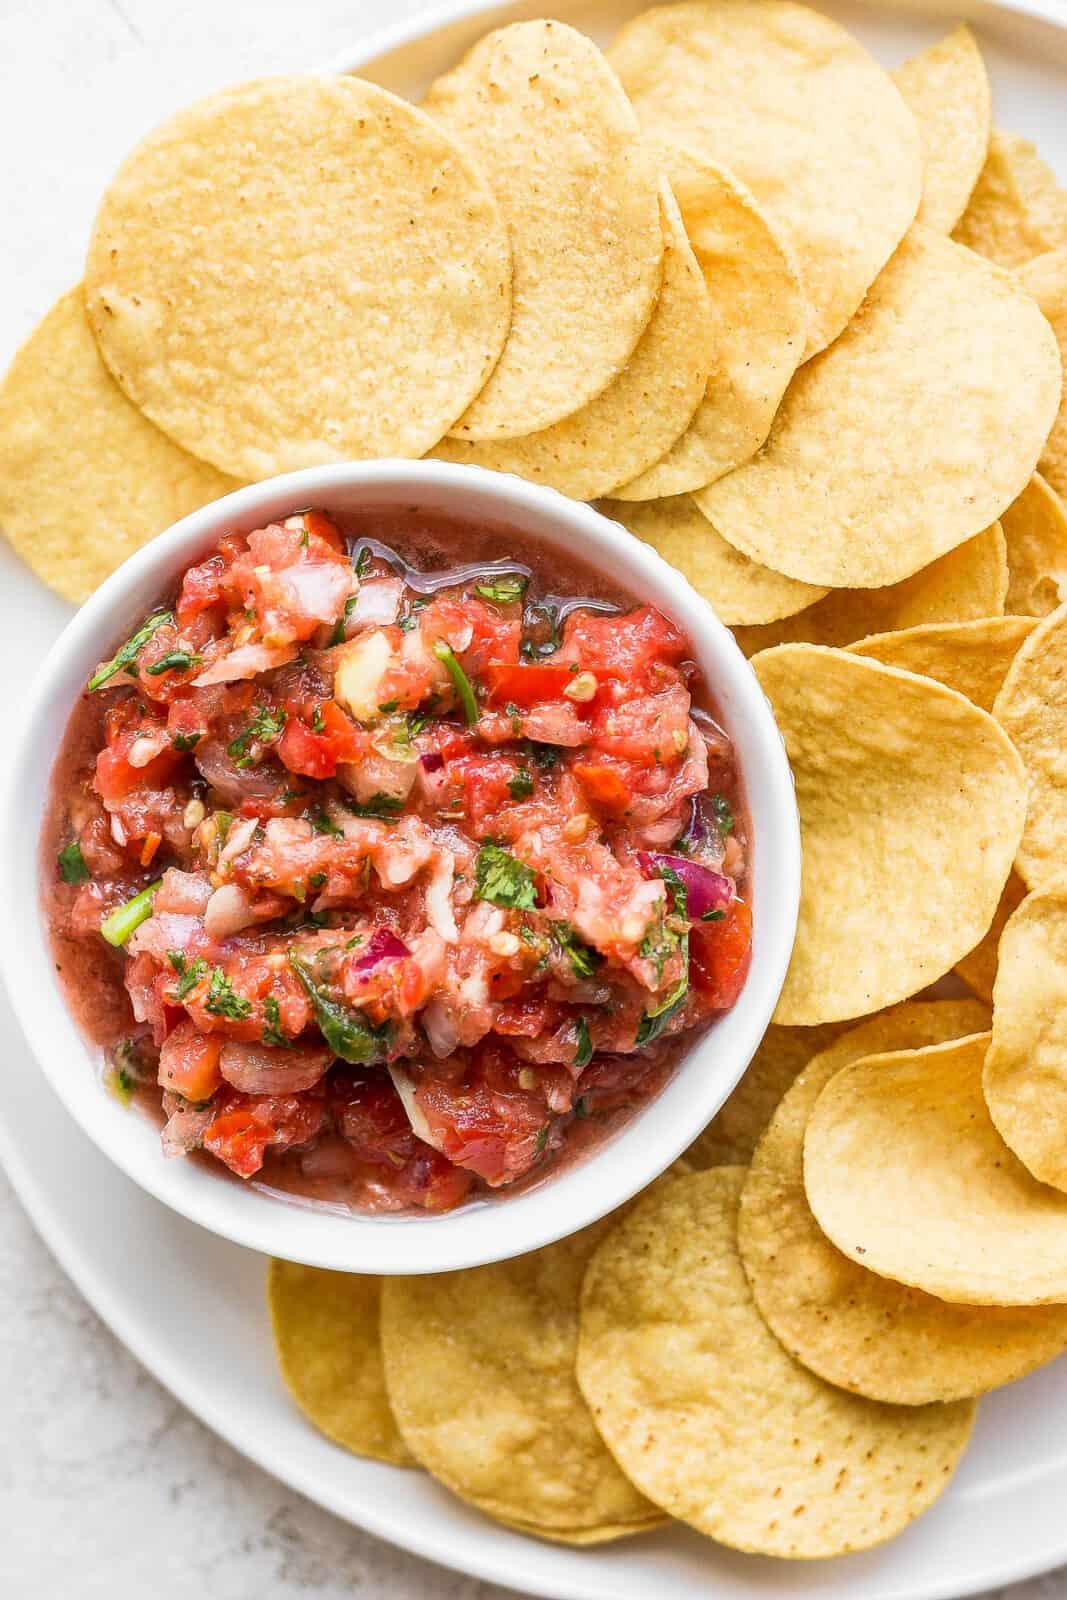 Bowl of blender salsa on a plate of chips.